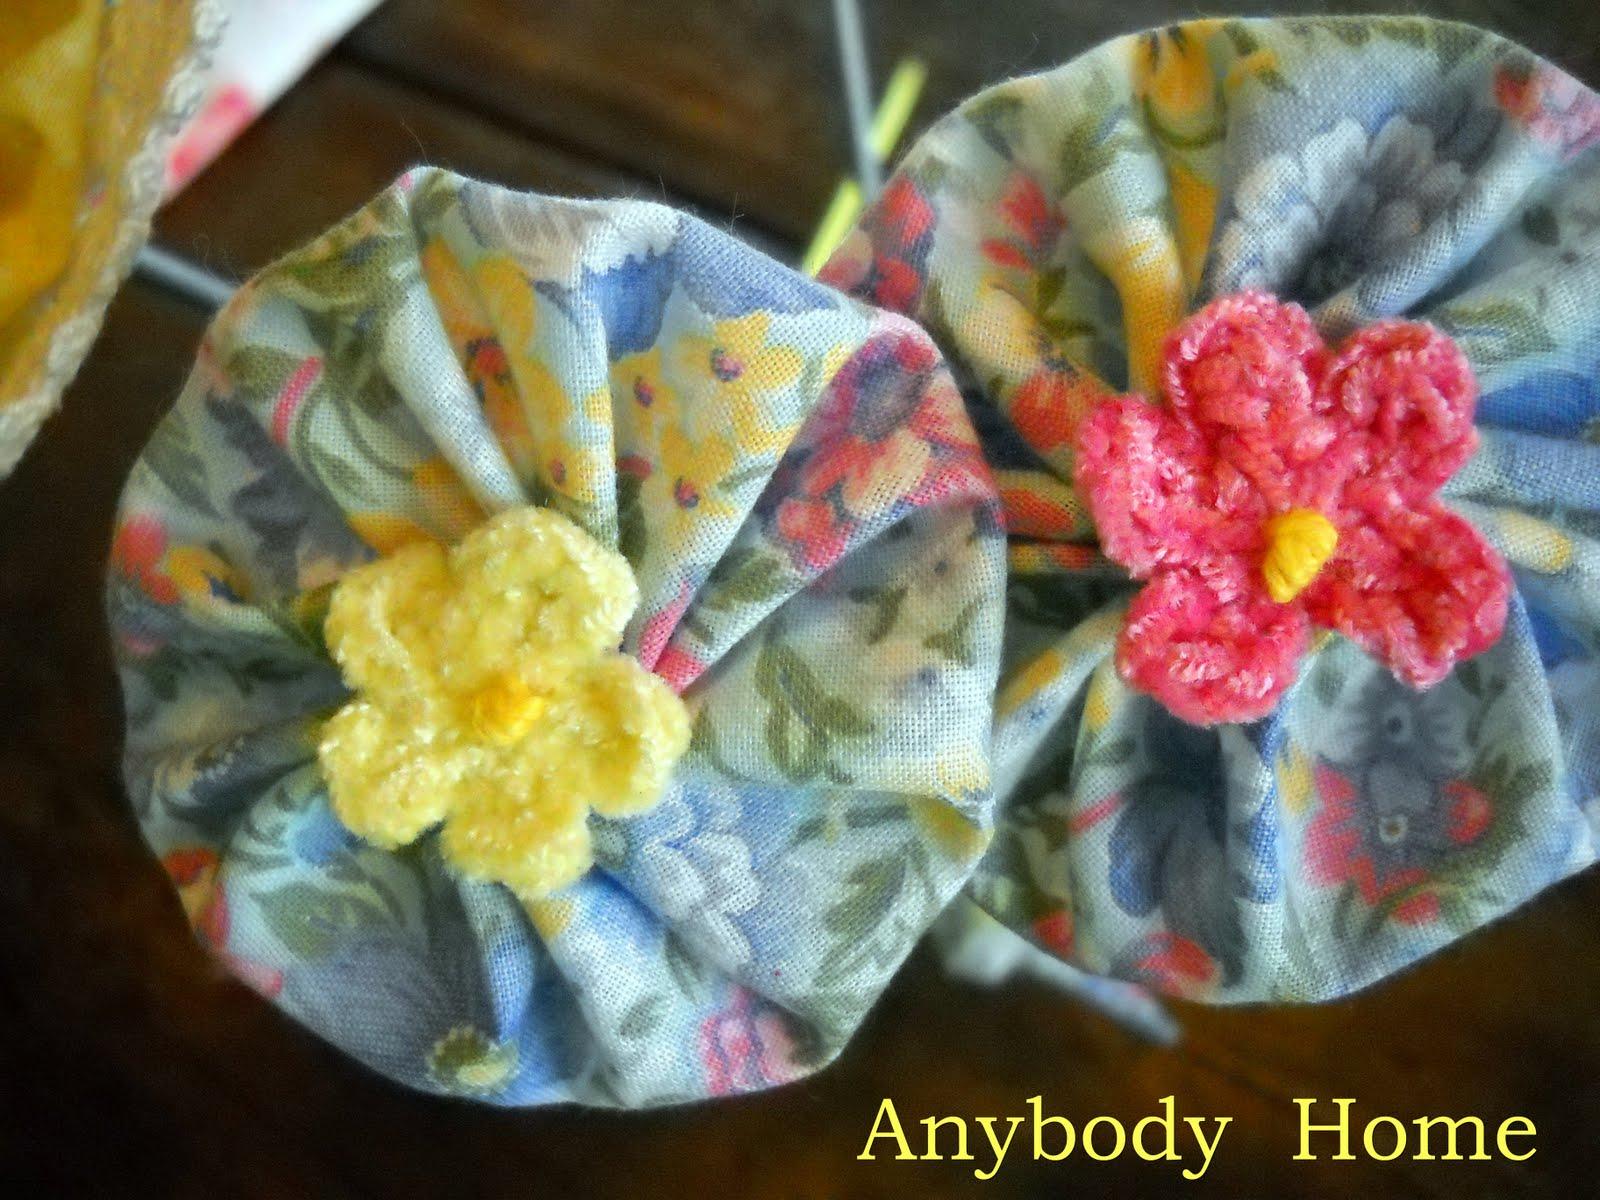 Anybody Home: Knitting Needle Yo-Yo Flower Bouquet